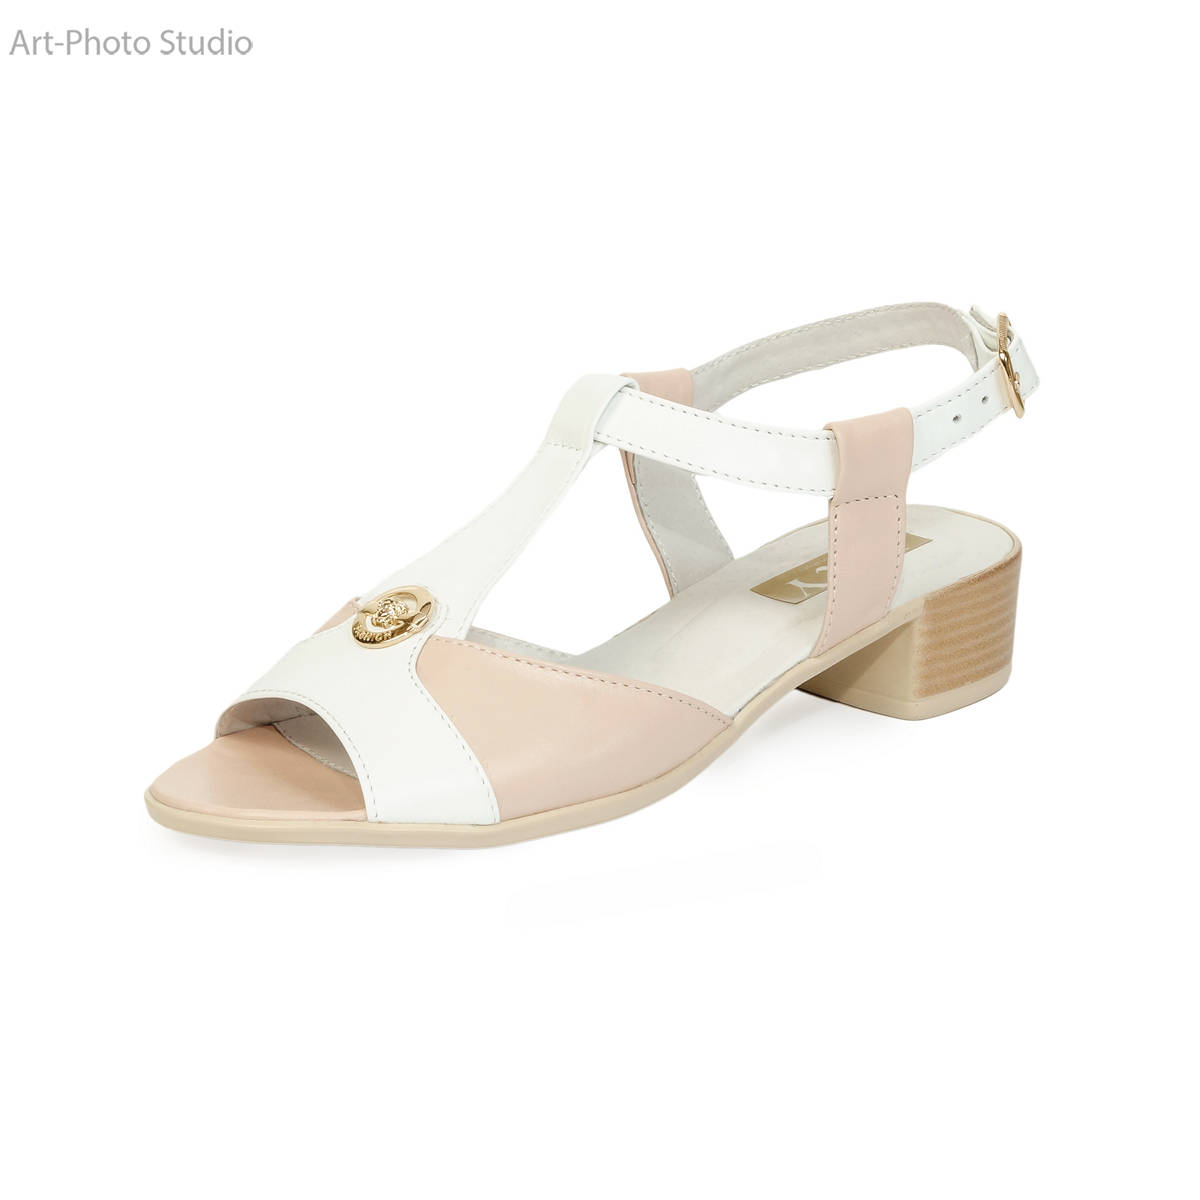 предметная съемка обуви белого цвета